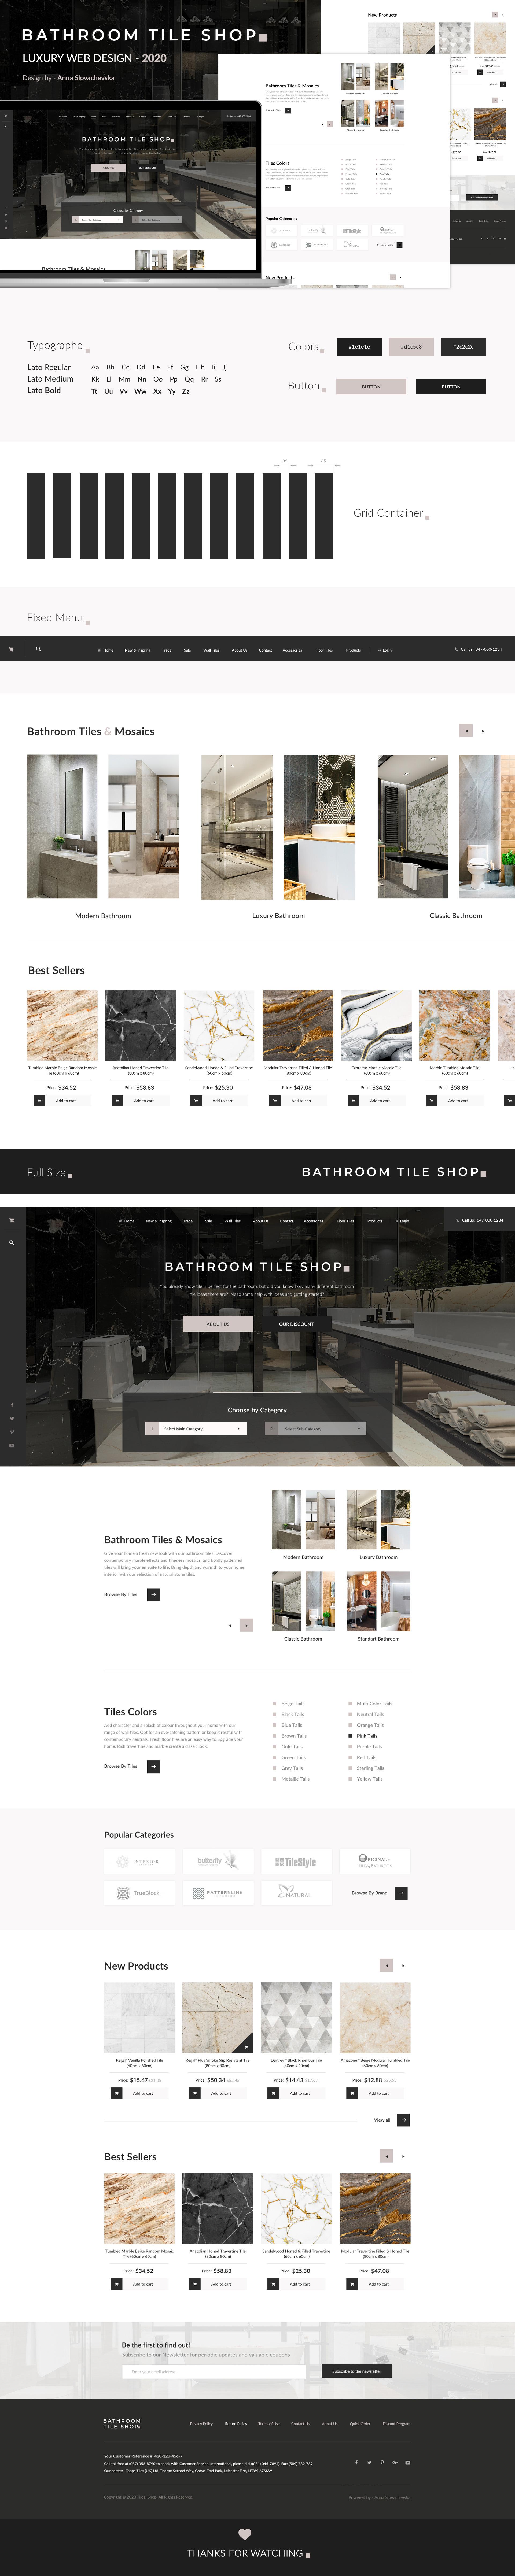 Web design - Luxury Bathroom tile shop